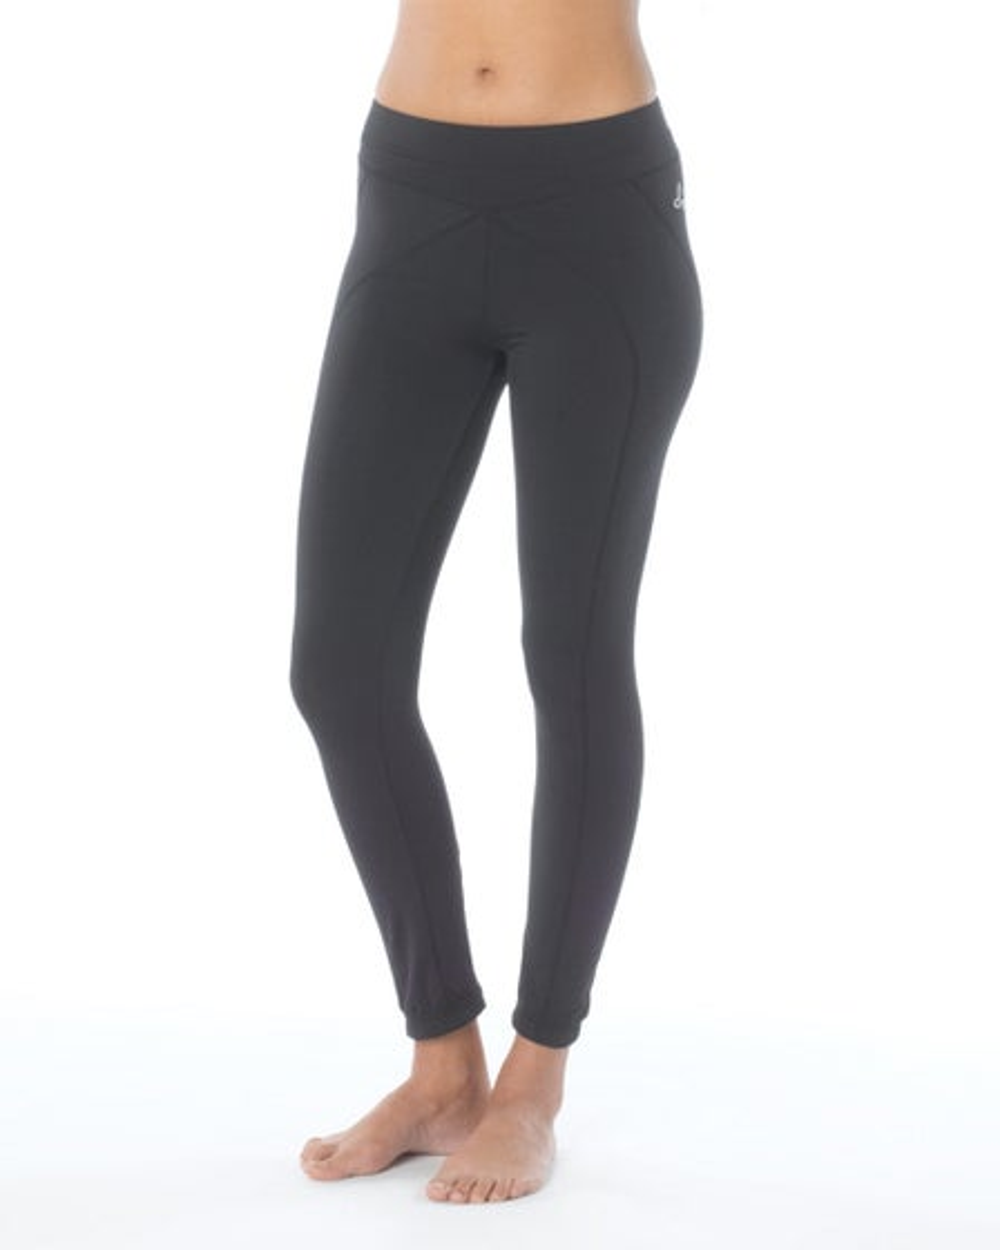 prAna Performance Gazelle Leggings Best Workout Pants